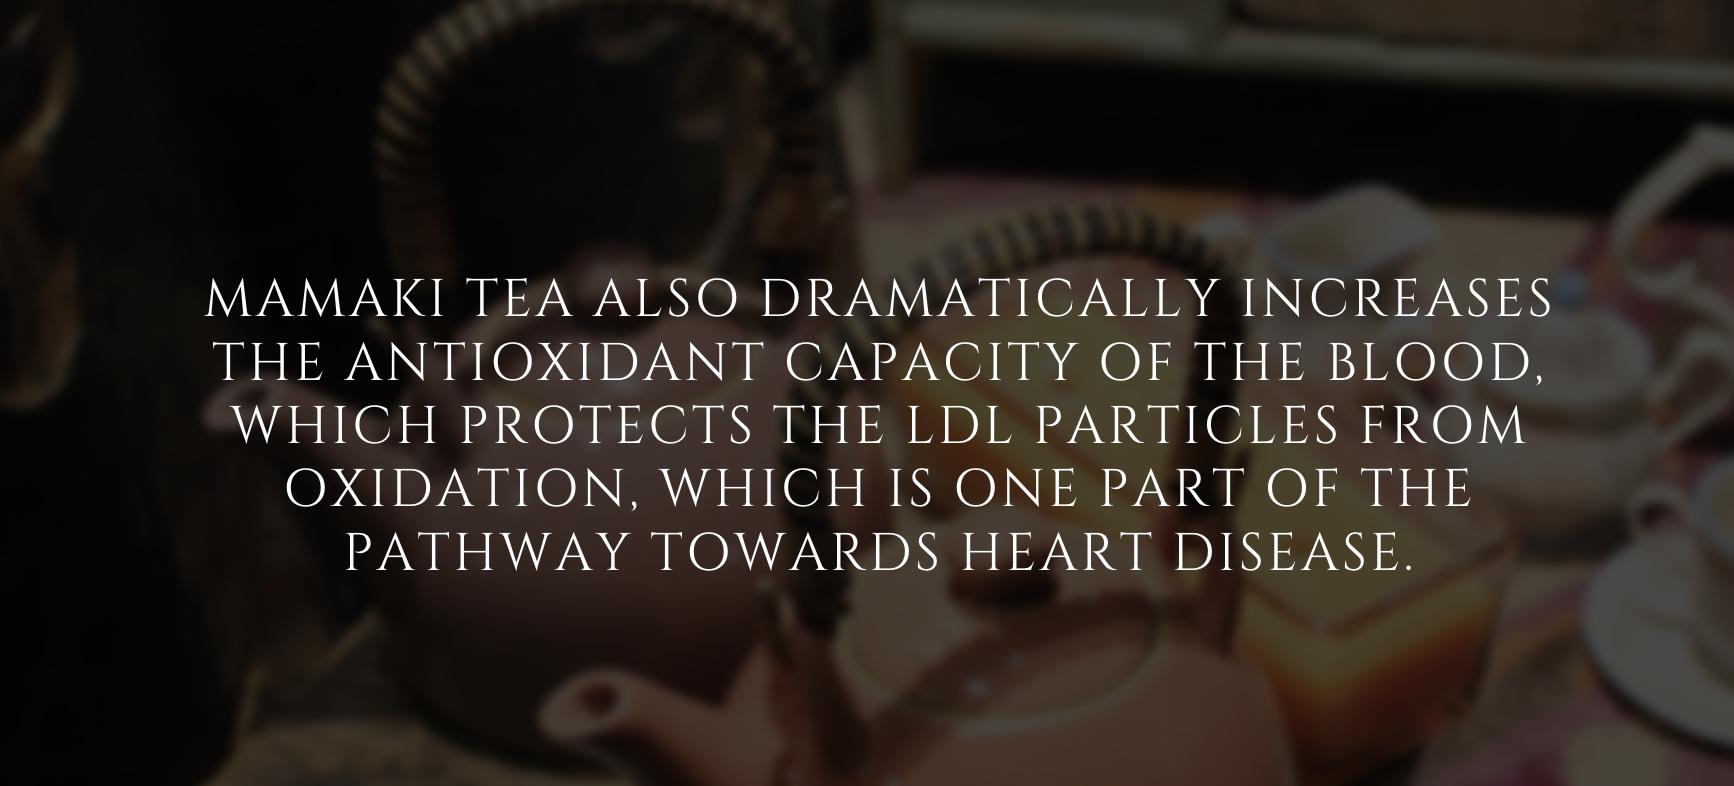 Mamaki tea benefit infographic